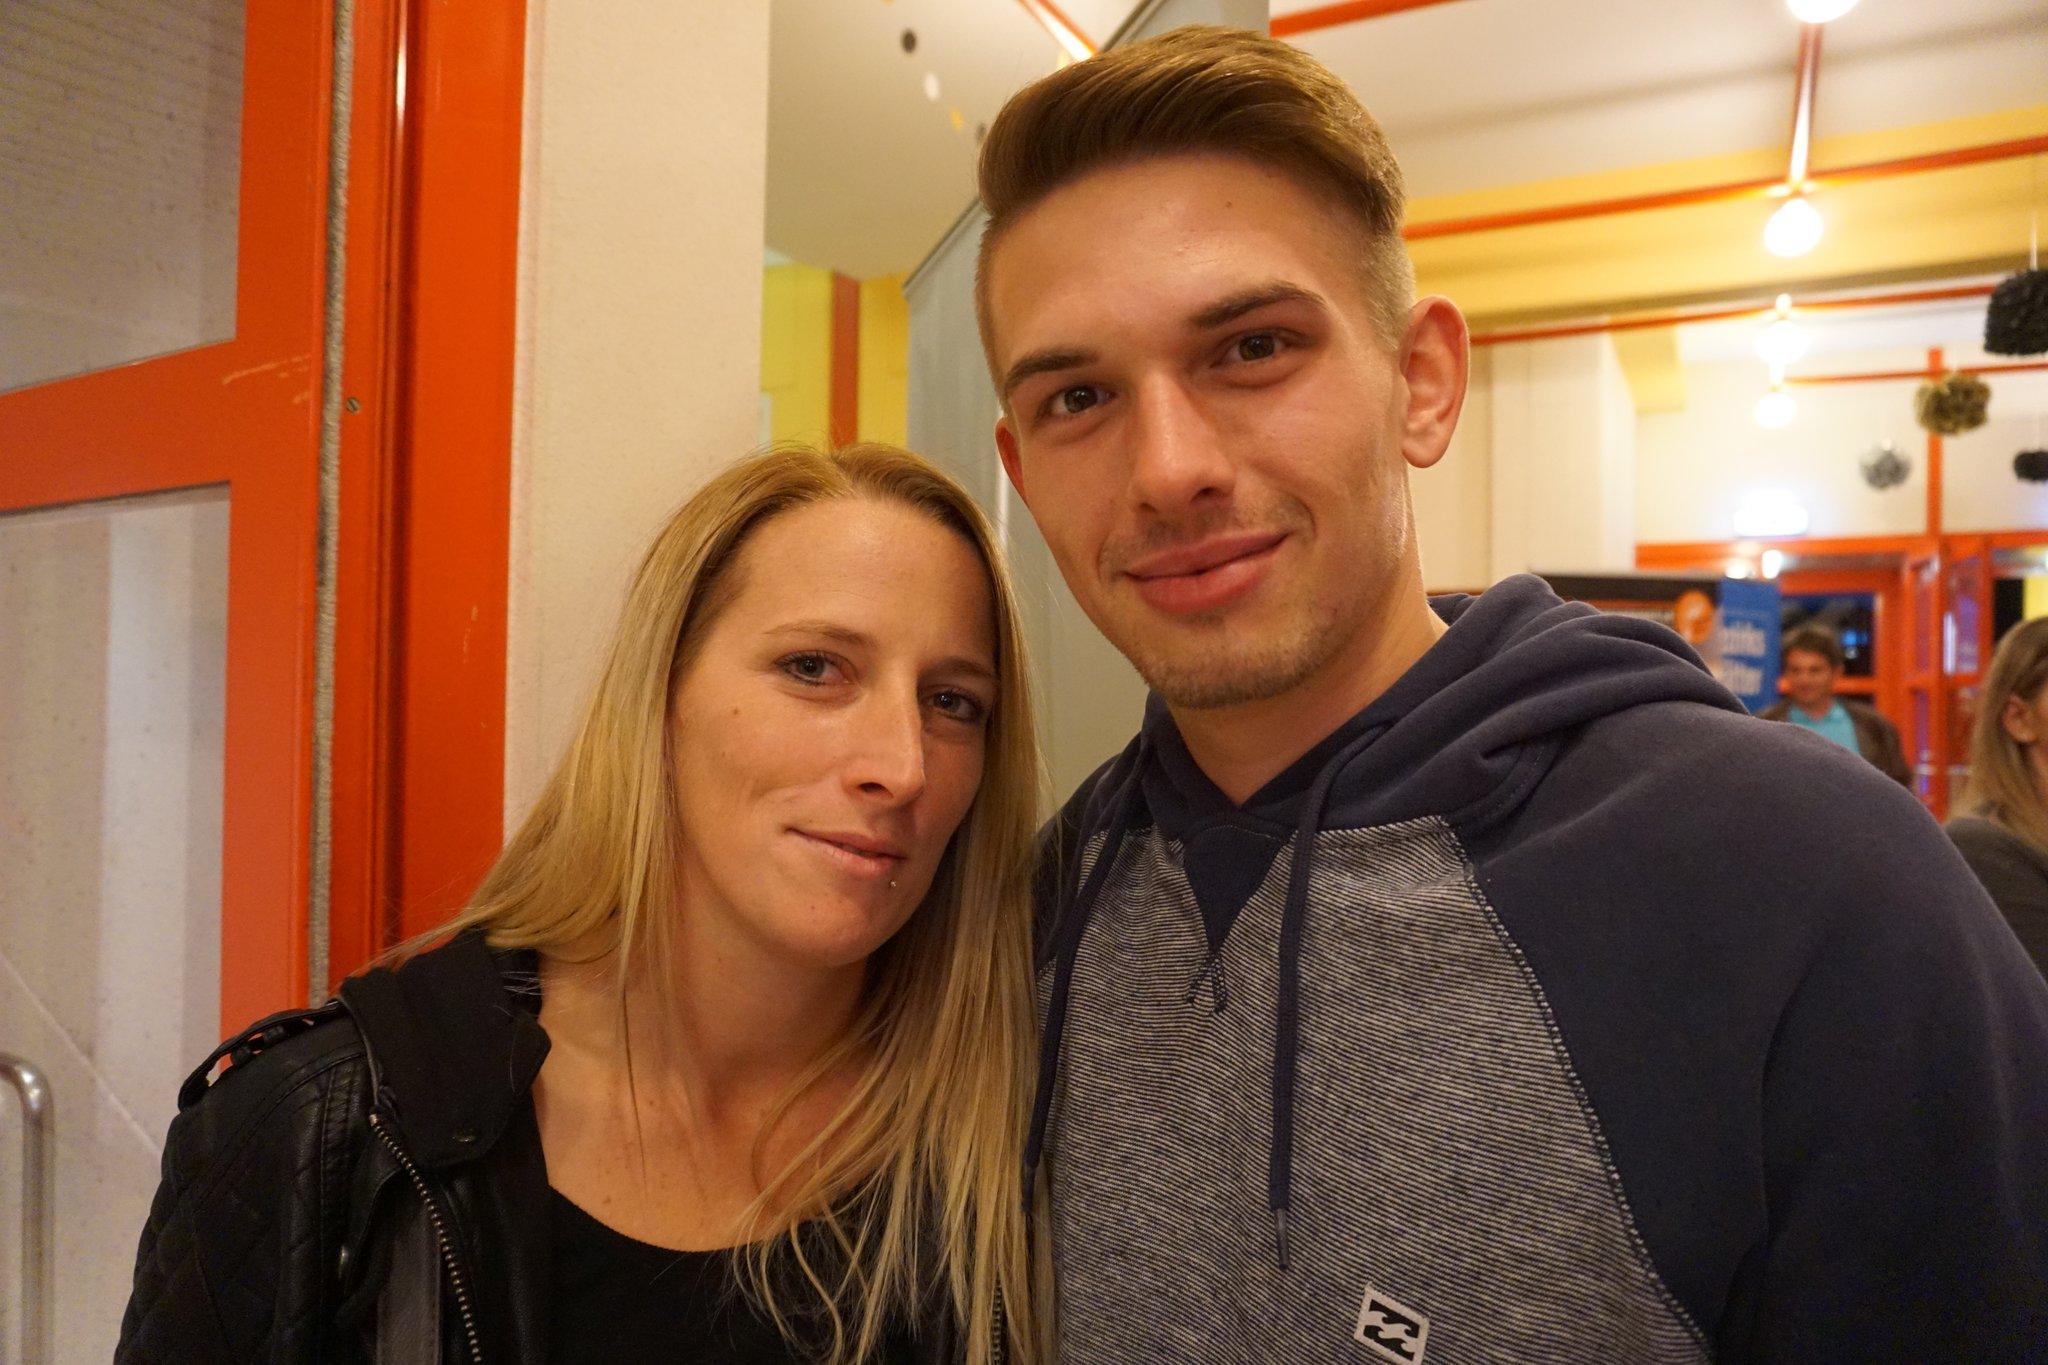 Ober-grafendorf flirt kostenlos - Niedernsill dating app